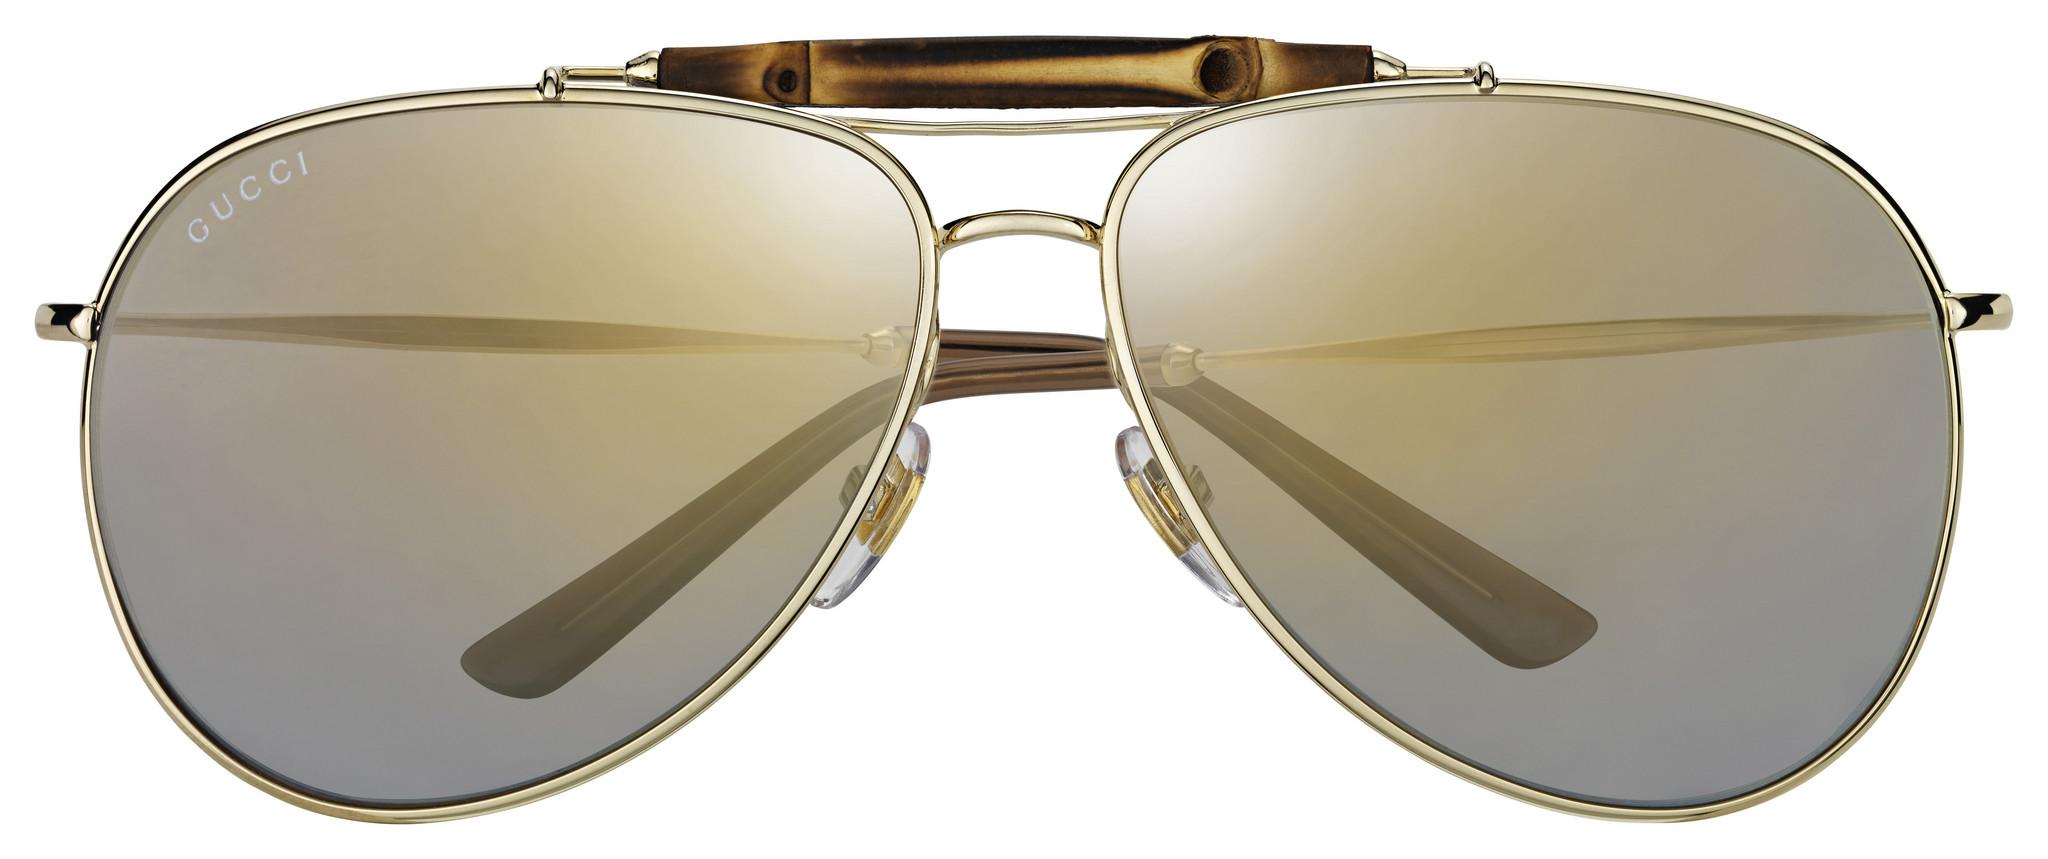 GUCCI- BambooGold sunglasses.jpg